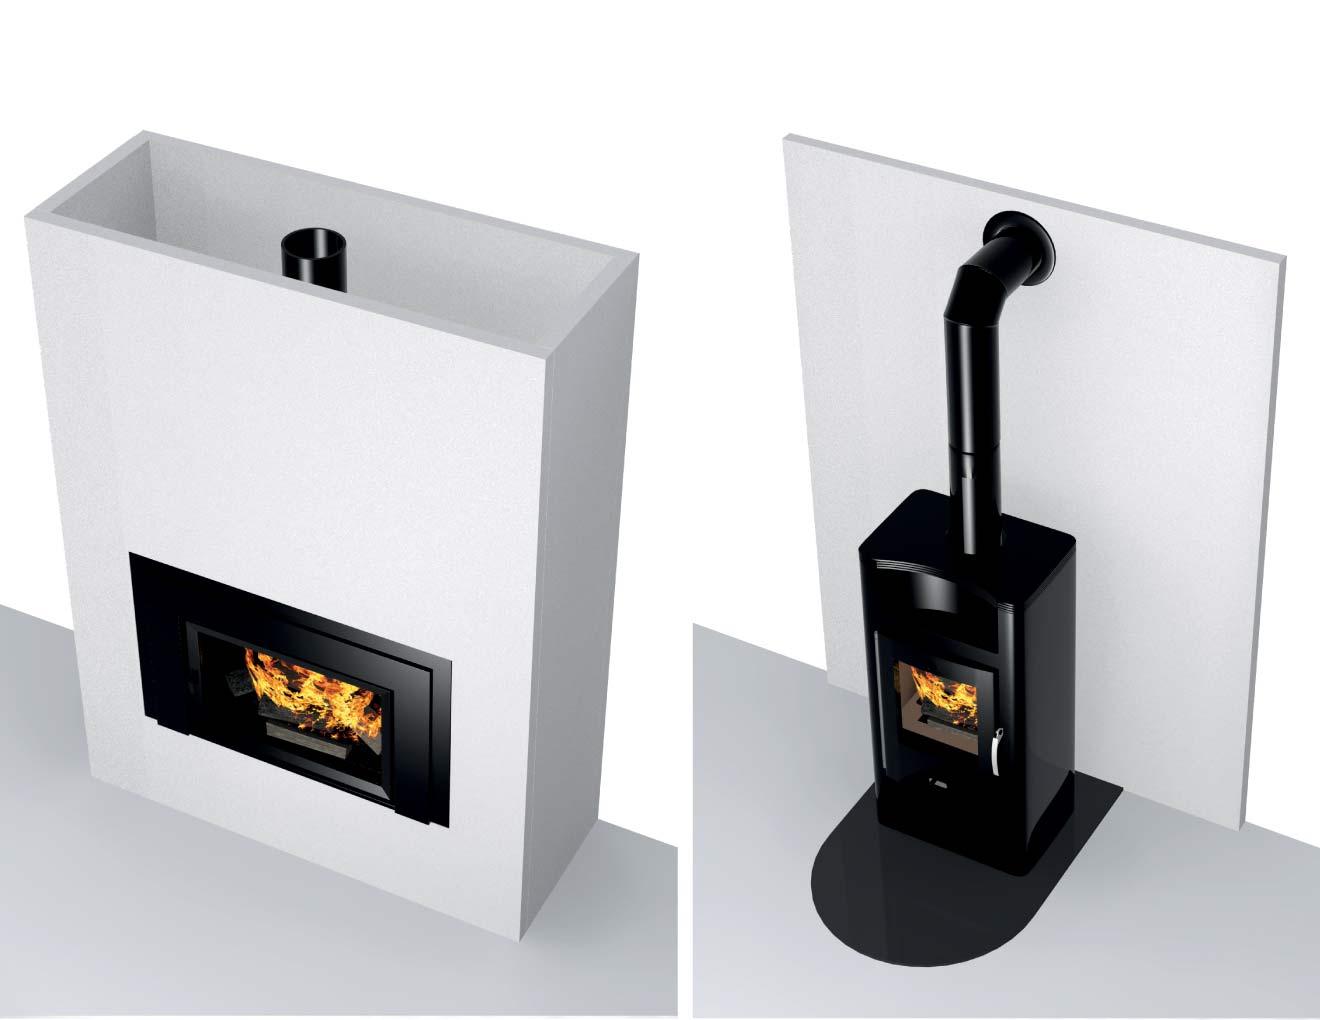 Skamotec heat boards Image